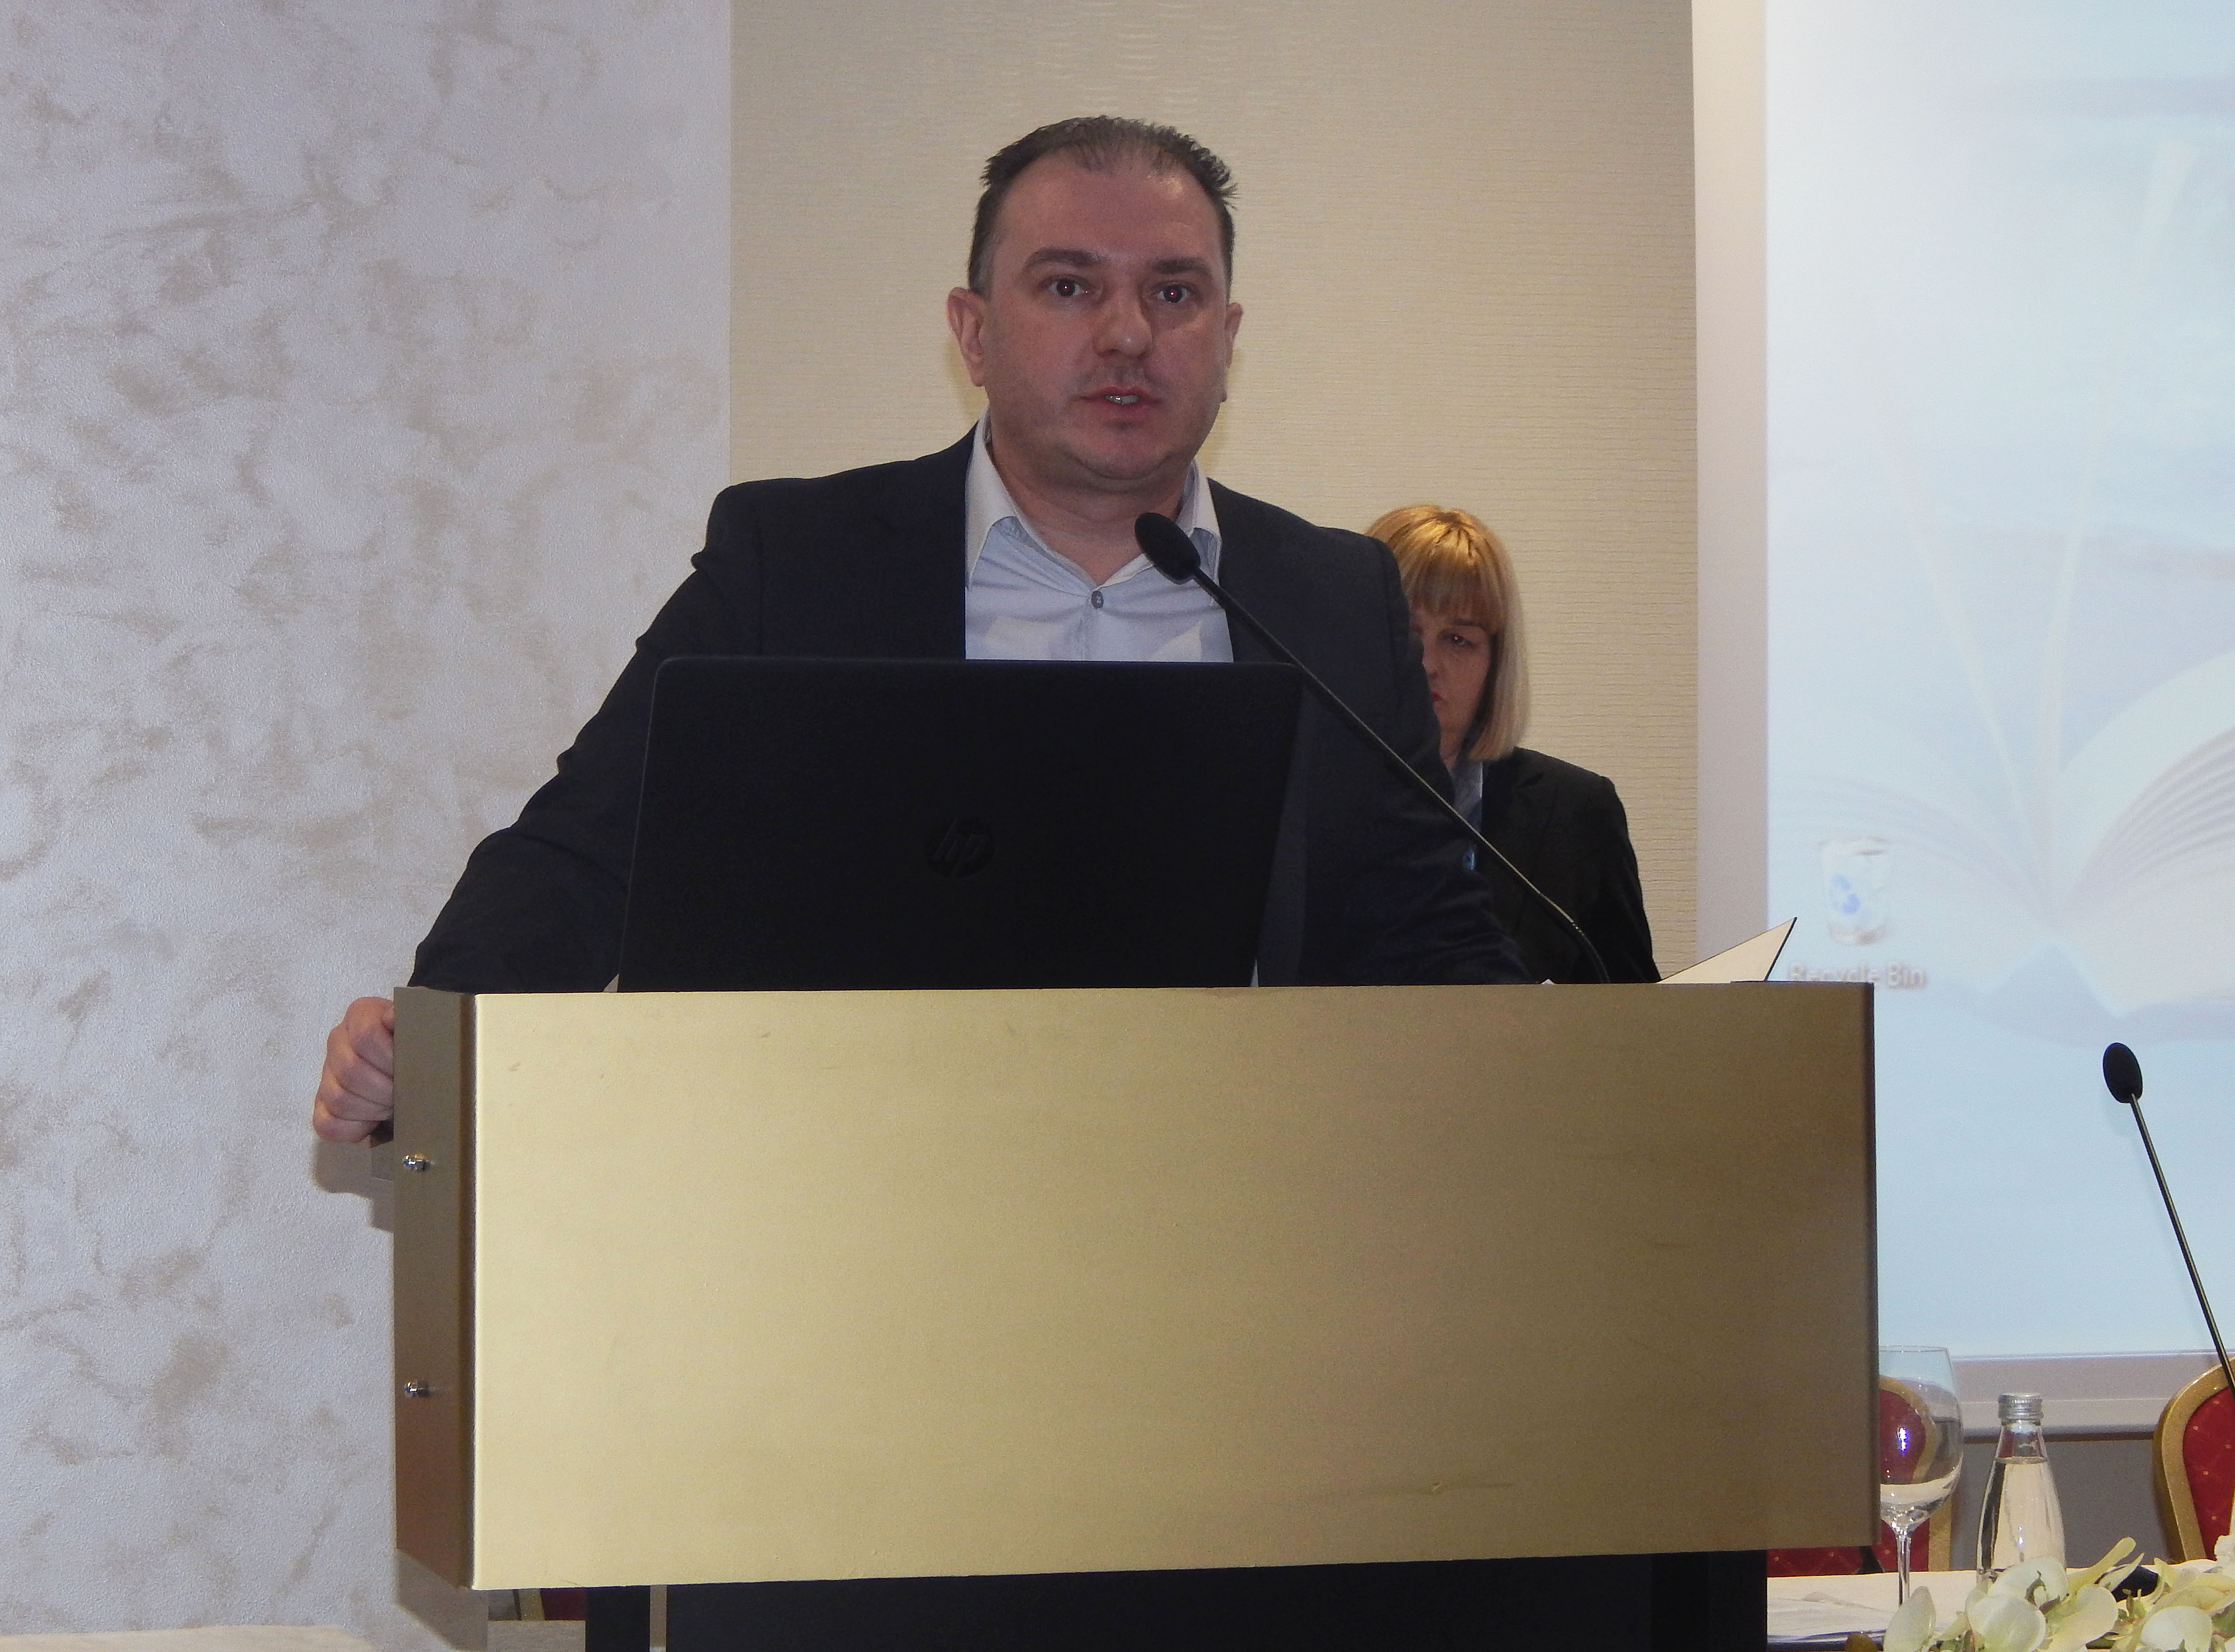 Radni skup u Mostaru: Moramo poštovati vodu i prirodu!